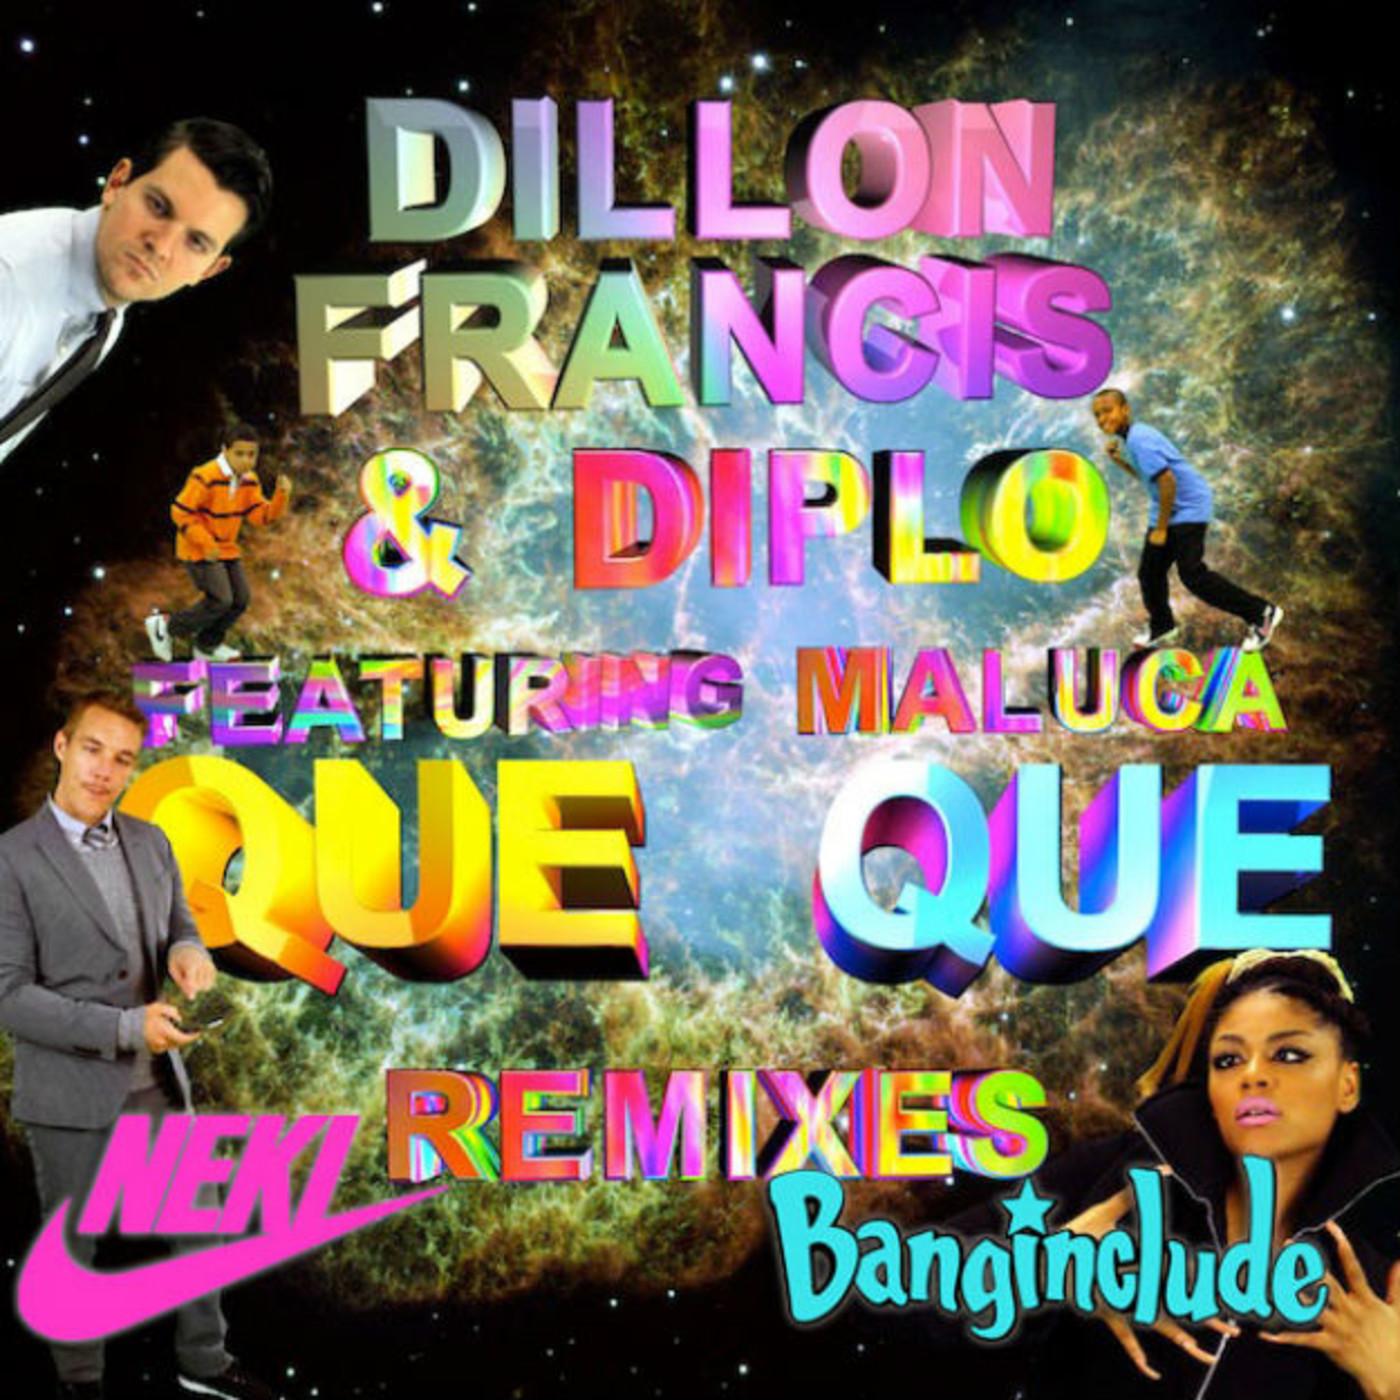 Dillon-Francis-Diplo-Ft